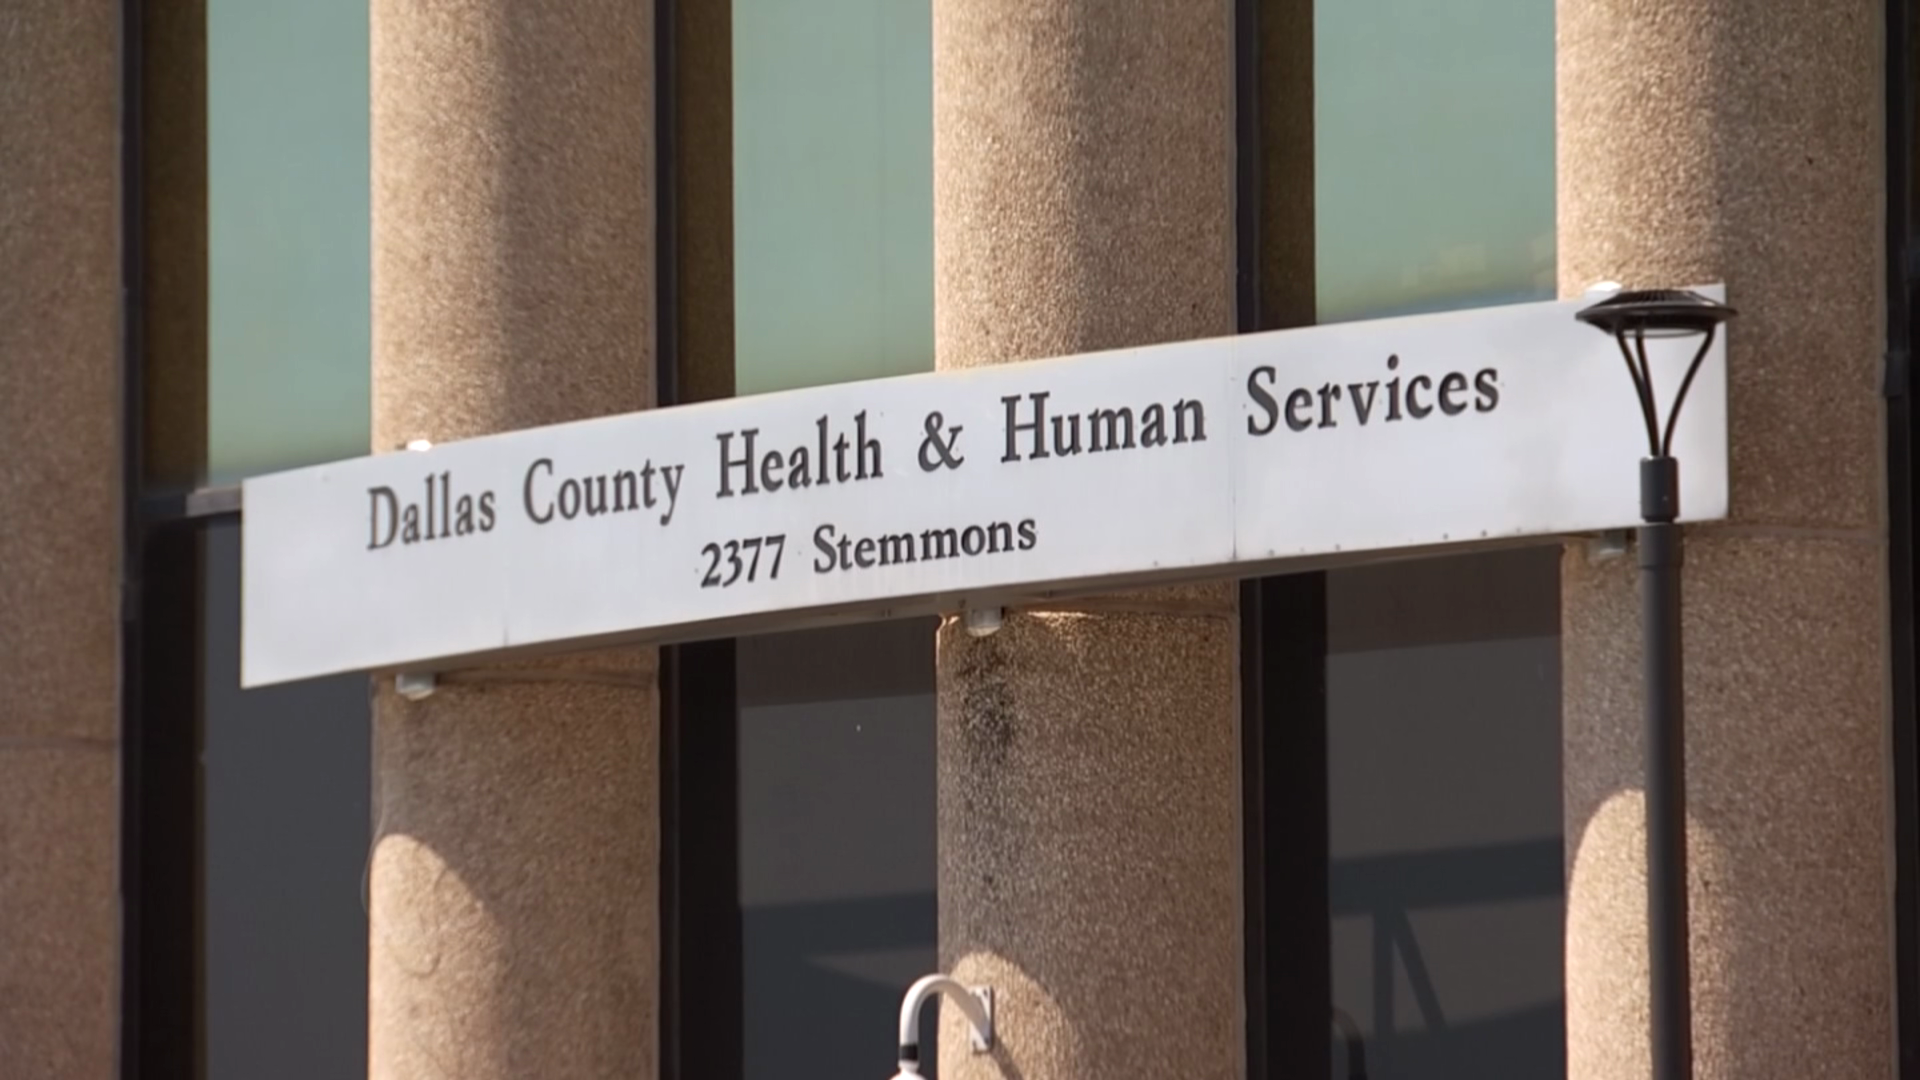 Dallas County Reports 373 Additional Cases of COVID-19, 2 More Deaths – NBC 5 Dallas-Fort Worth